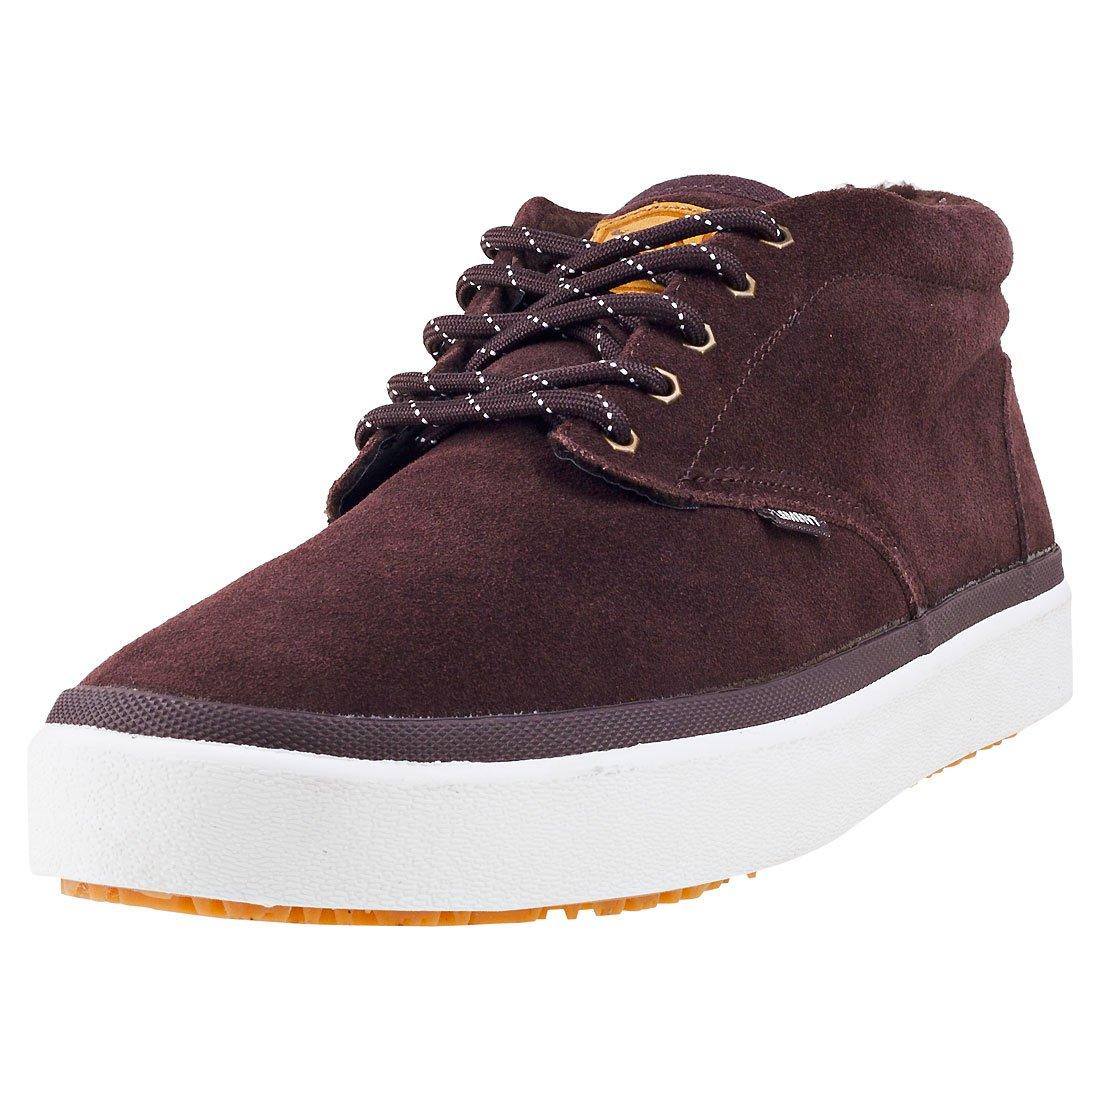 Element Chocolate Wildleder Preston - Schuhe Sherpa Lined Schuhe - 7a60b5